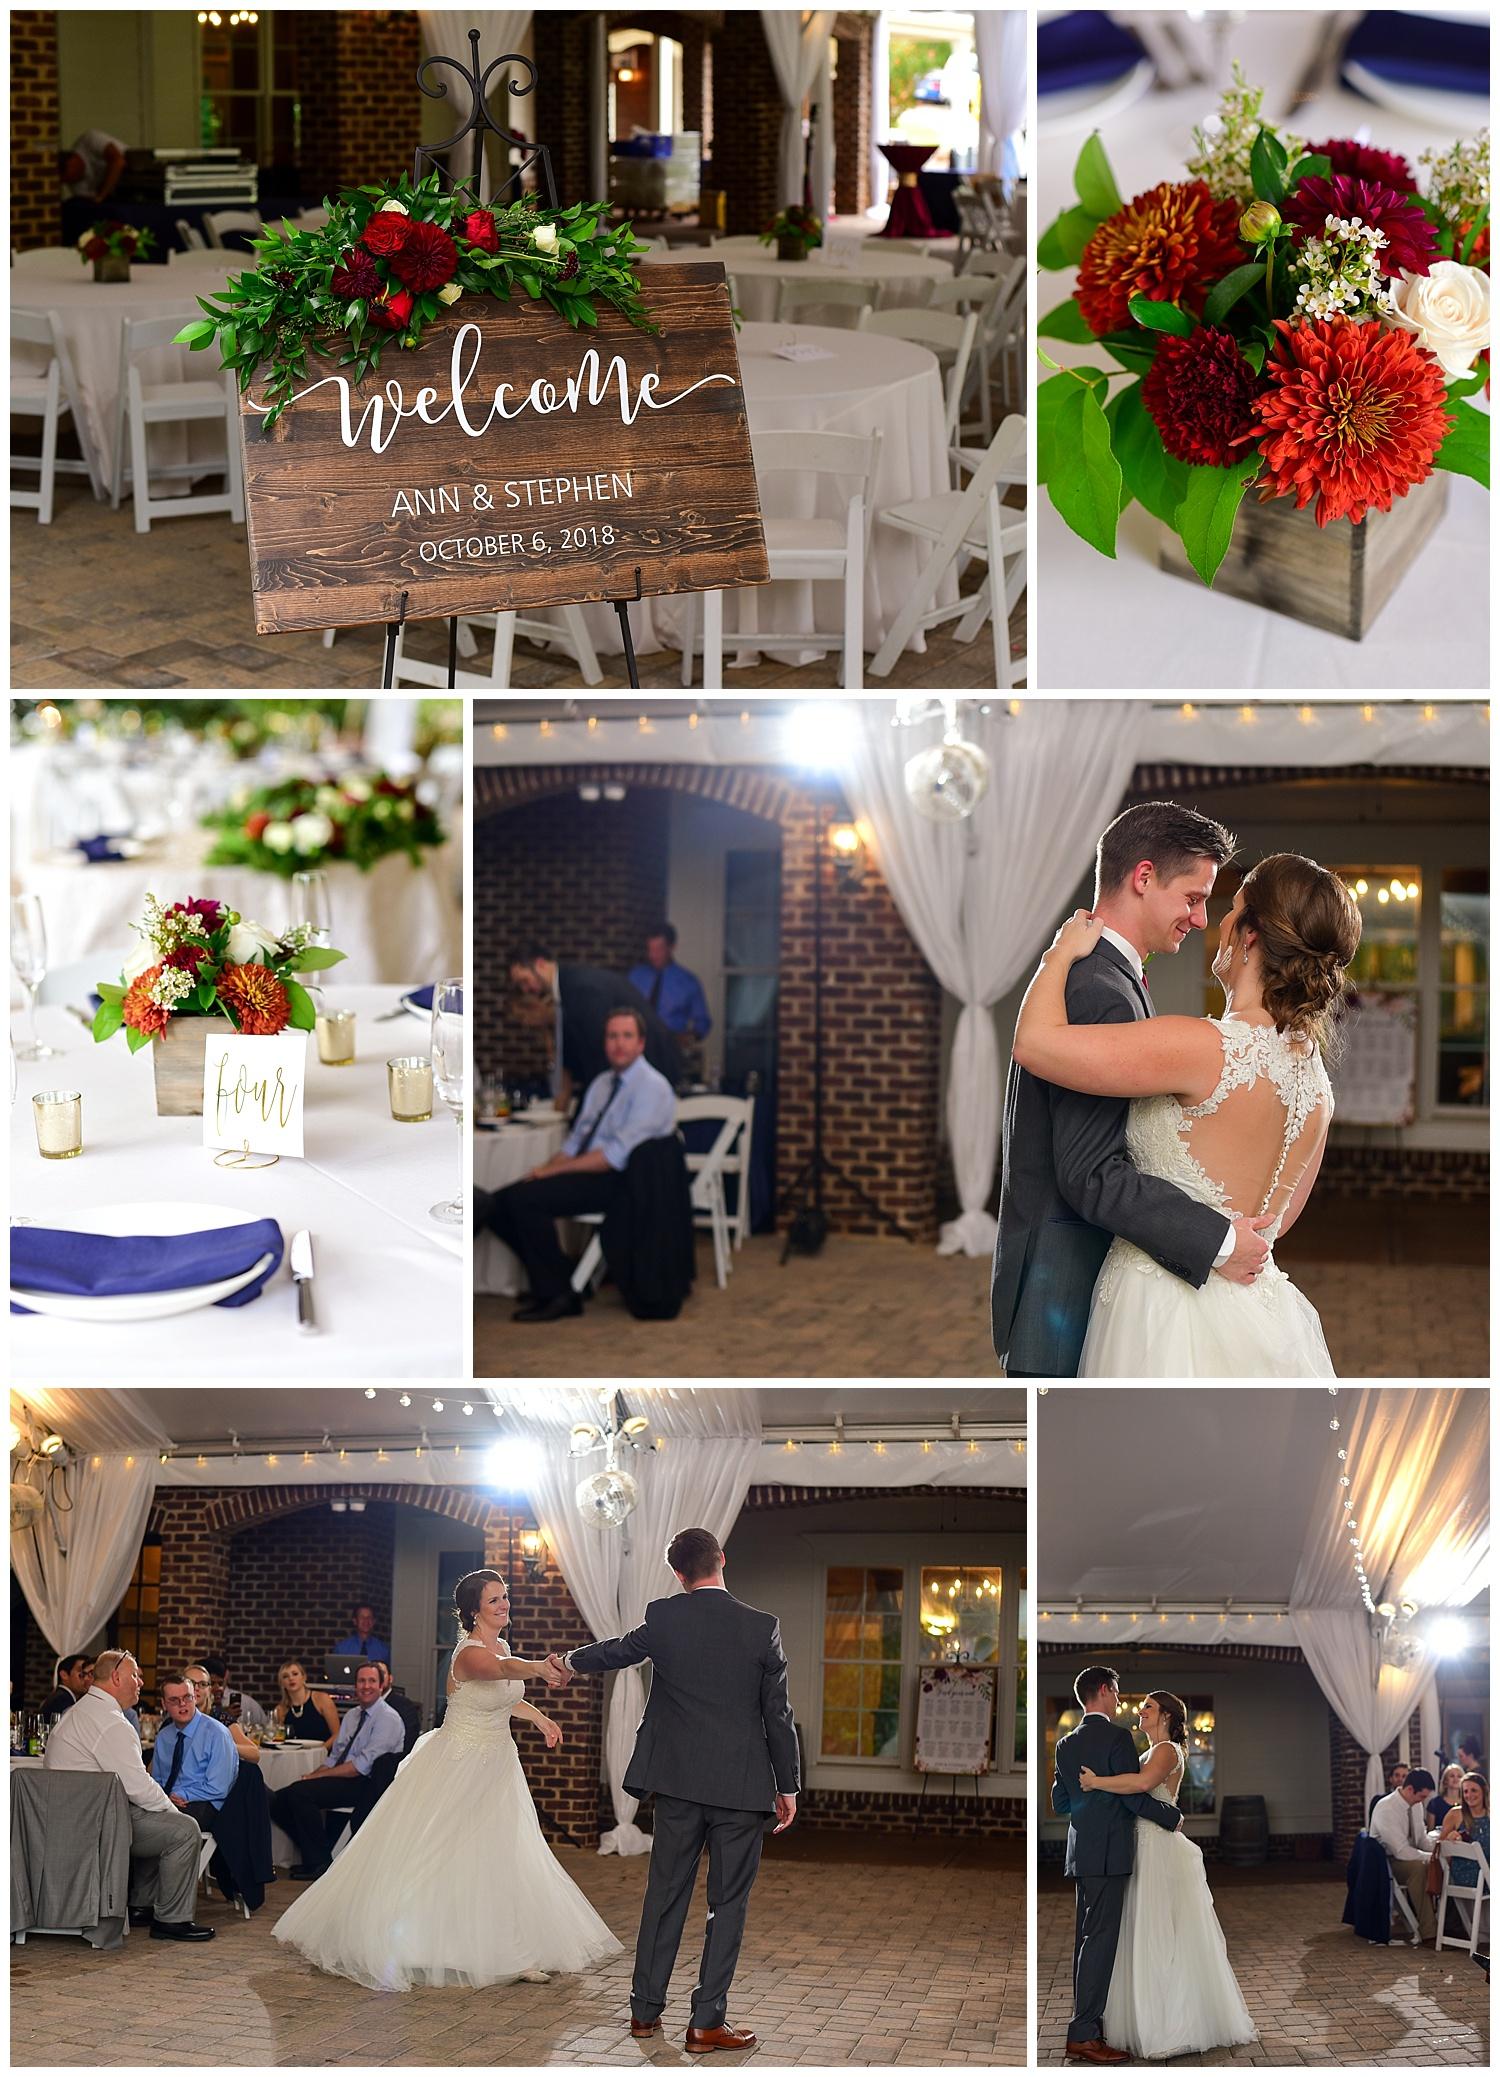 Oaks at Salem Fall Wedding Reception